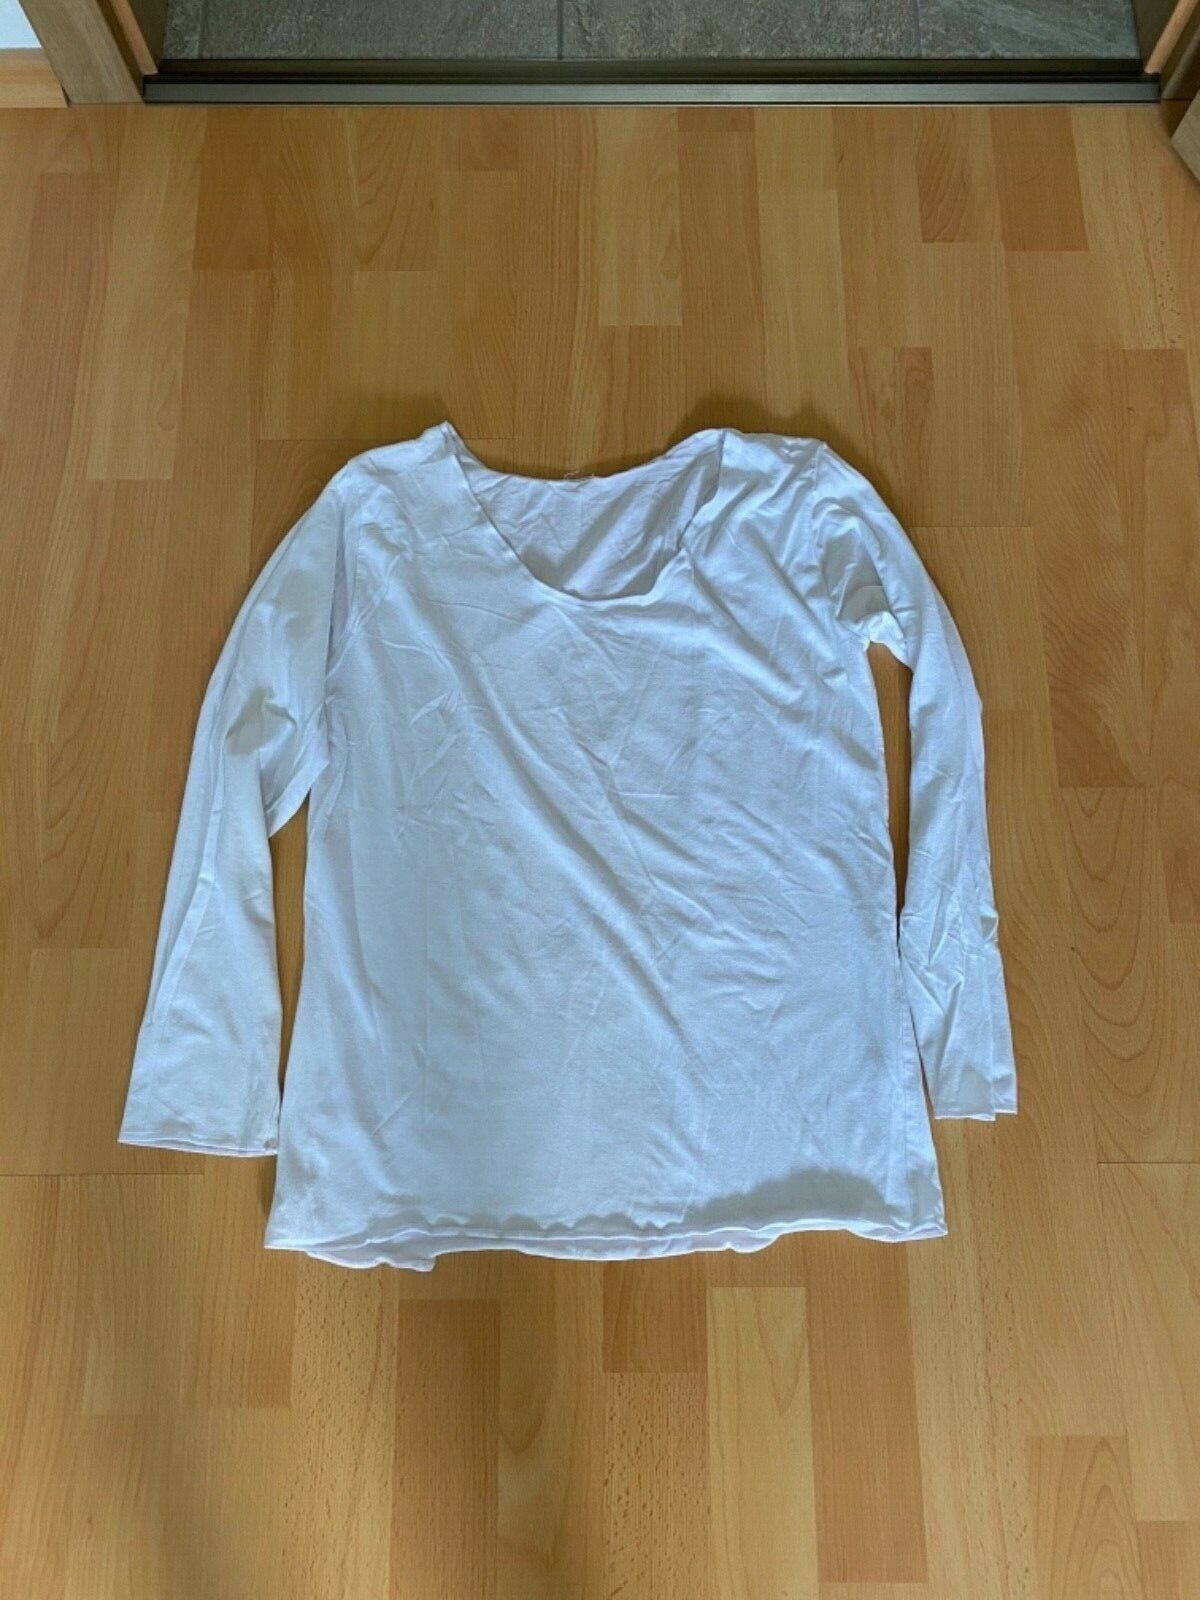 2 Damen Langarmshirt Shirt (1x Gina Laura) Größe M (40 / 42)